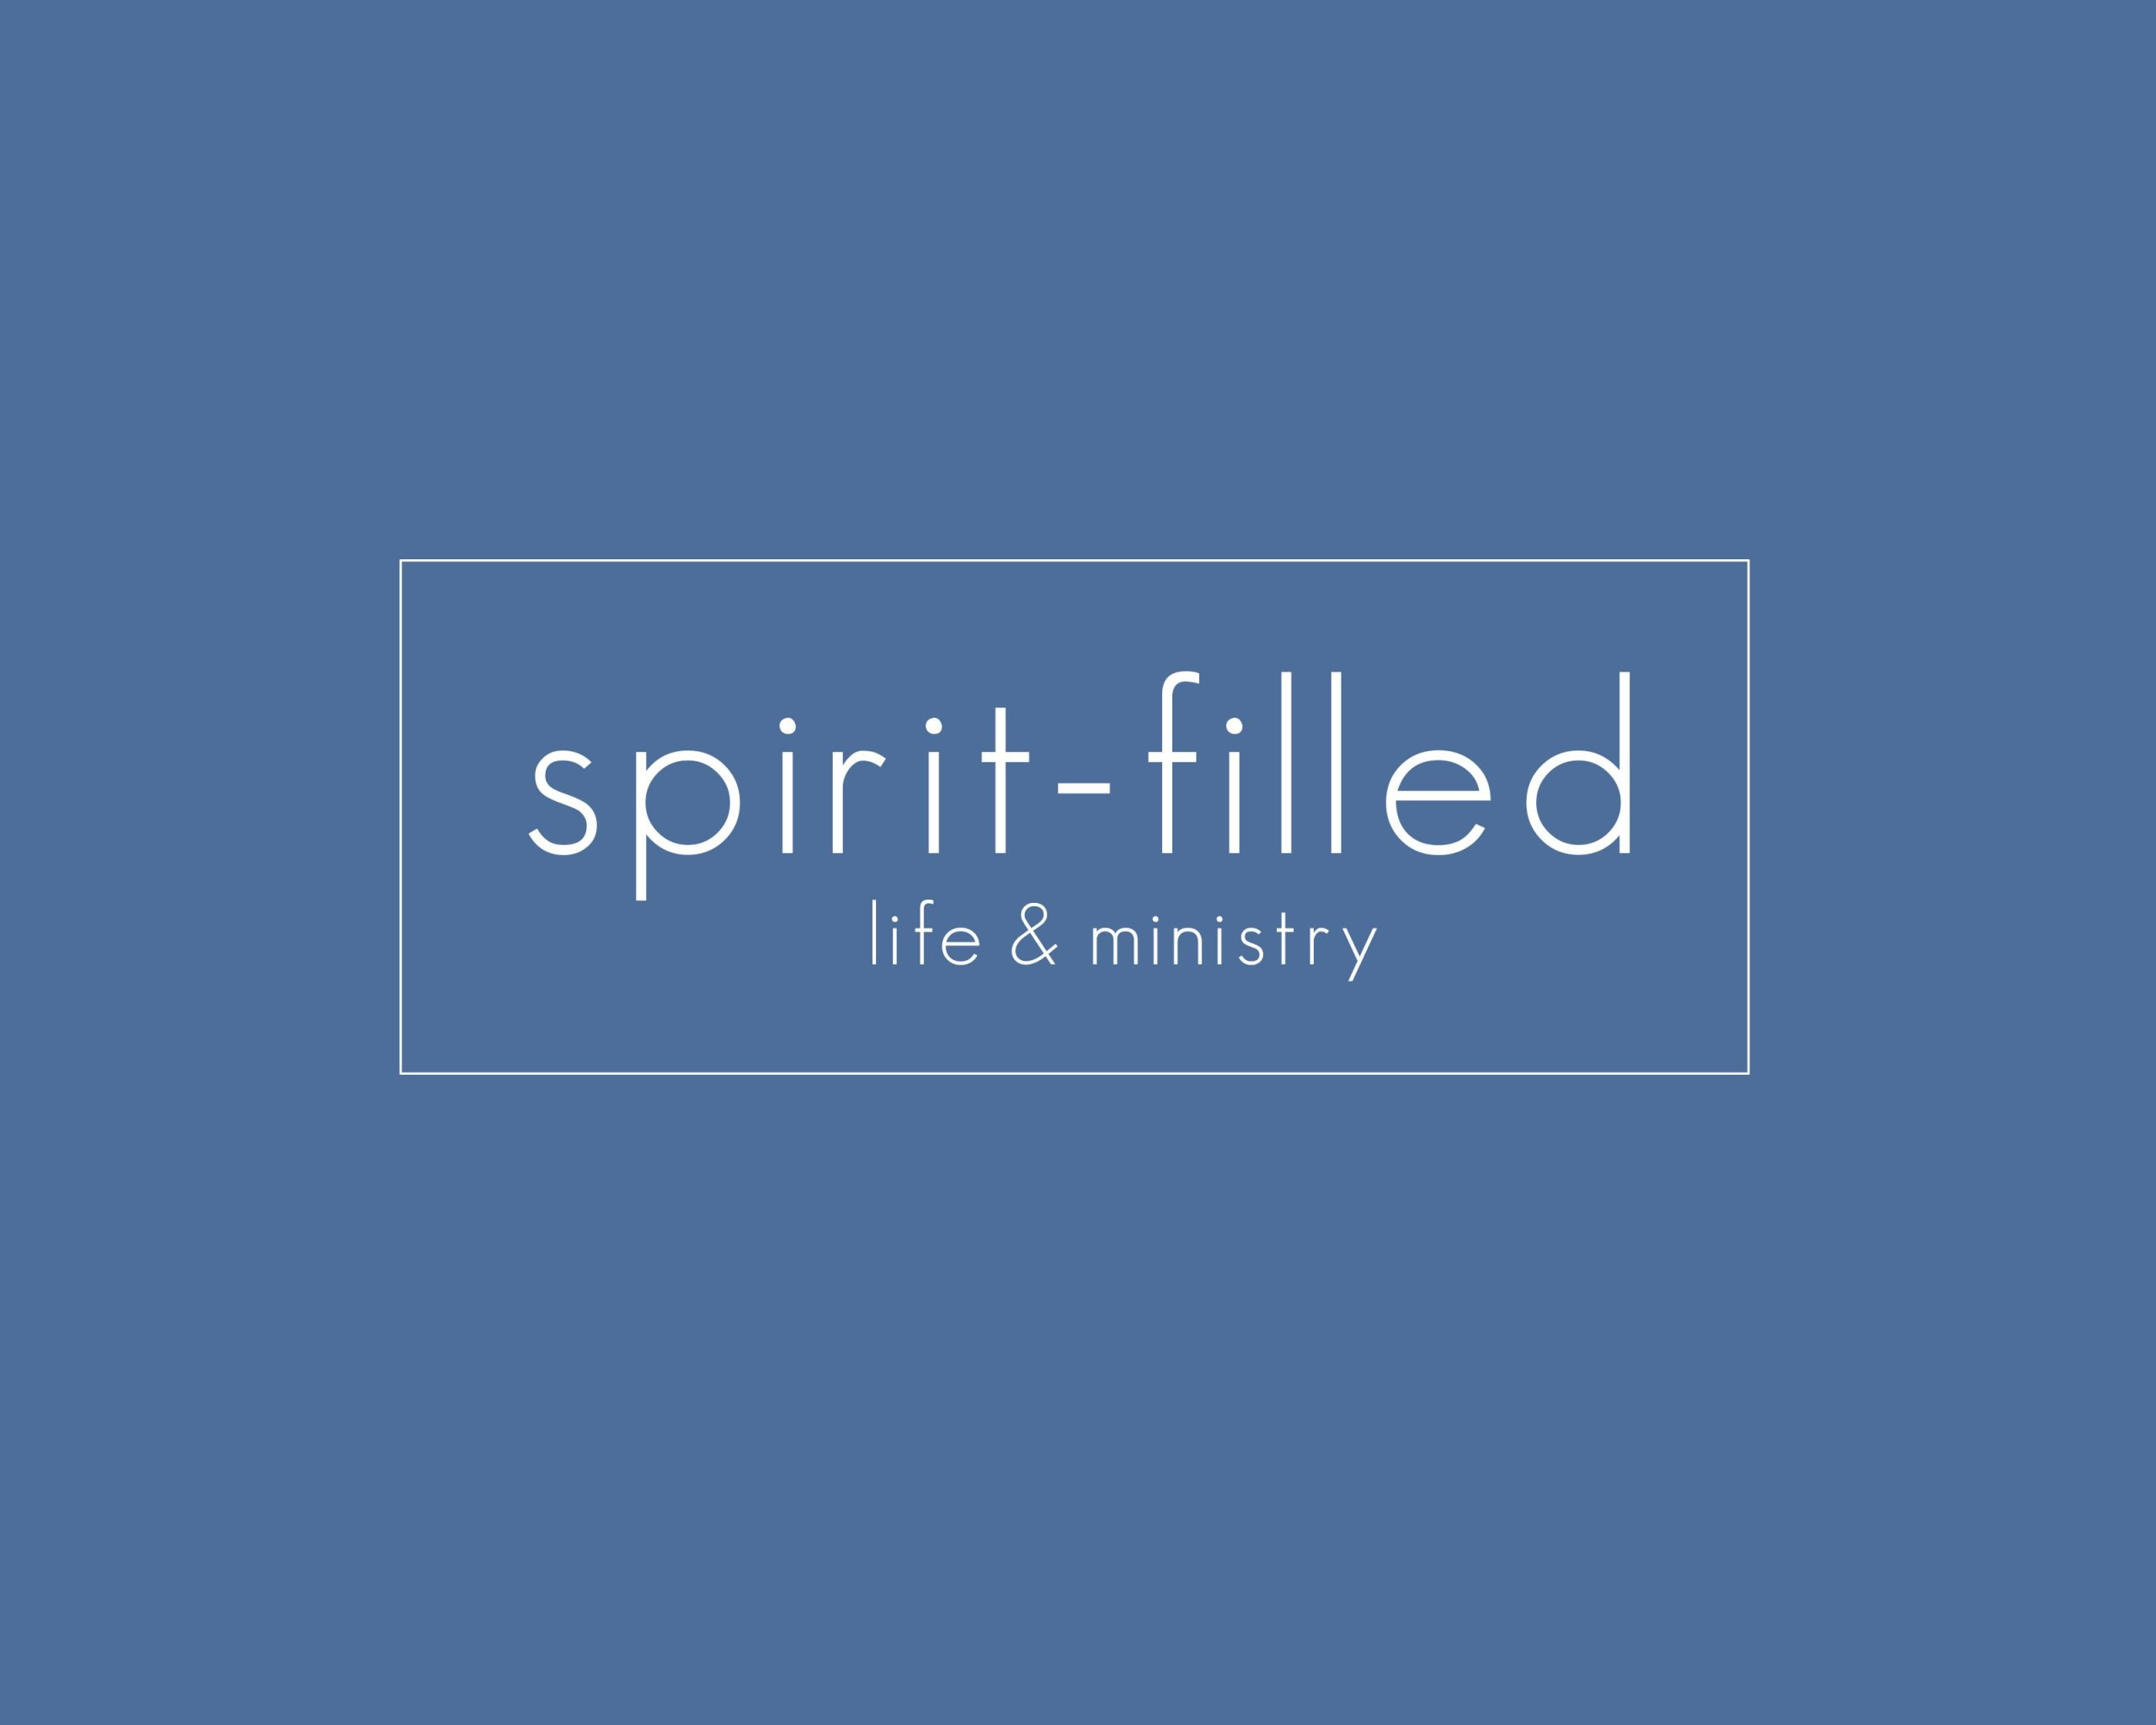 spirit-filled life & ministry poster6